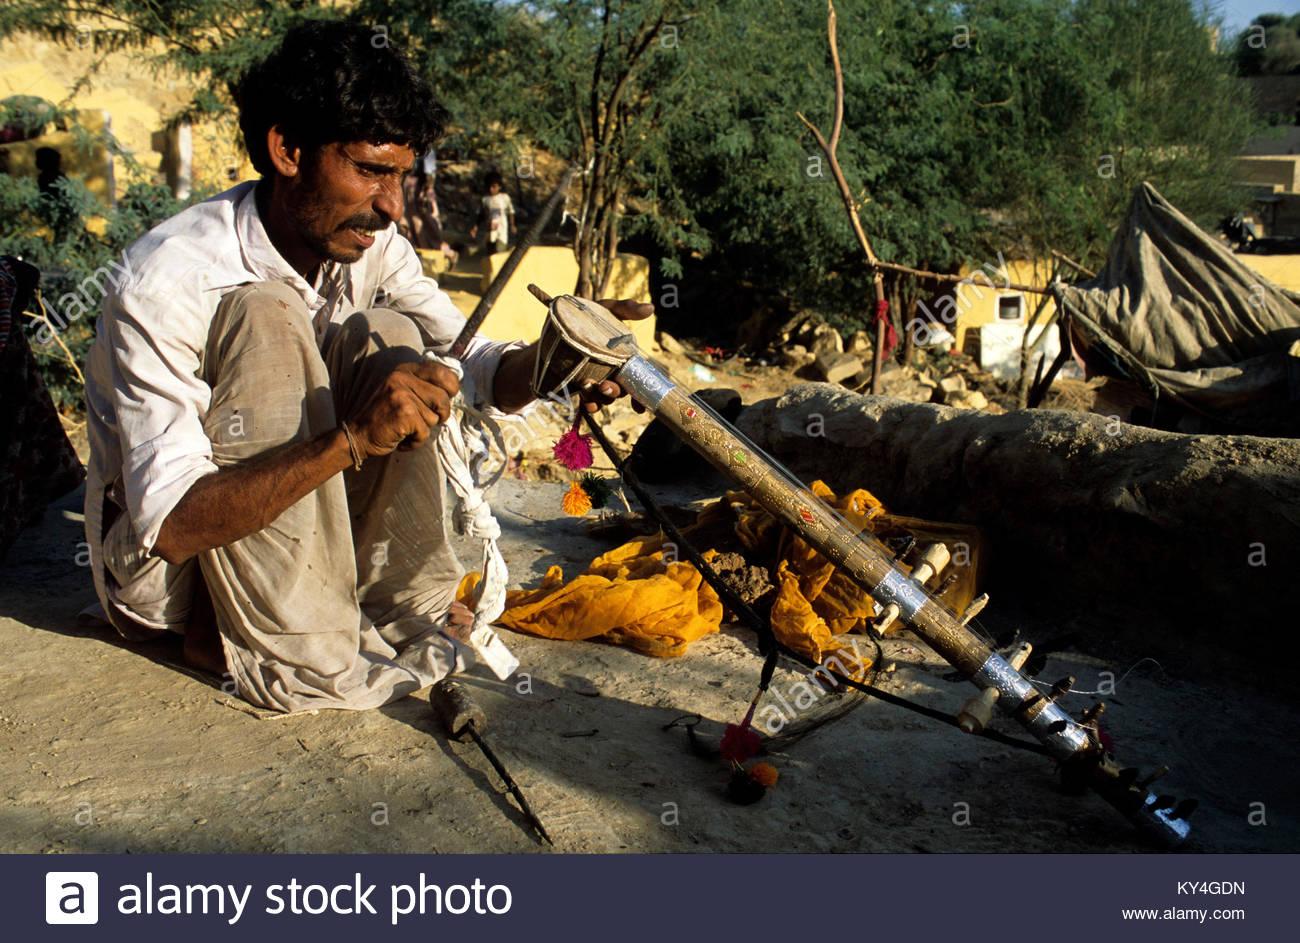 Rajasthan, Jaisalmer, Ghasi, fabricant de rawanata. *** A man is making a rawantana, musical instrument, Jaisalmer, - Stock Image